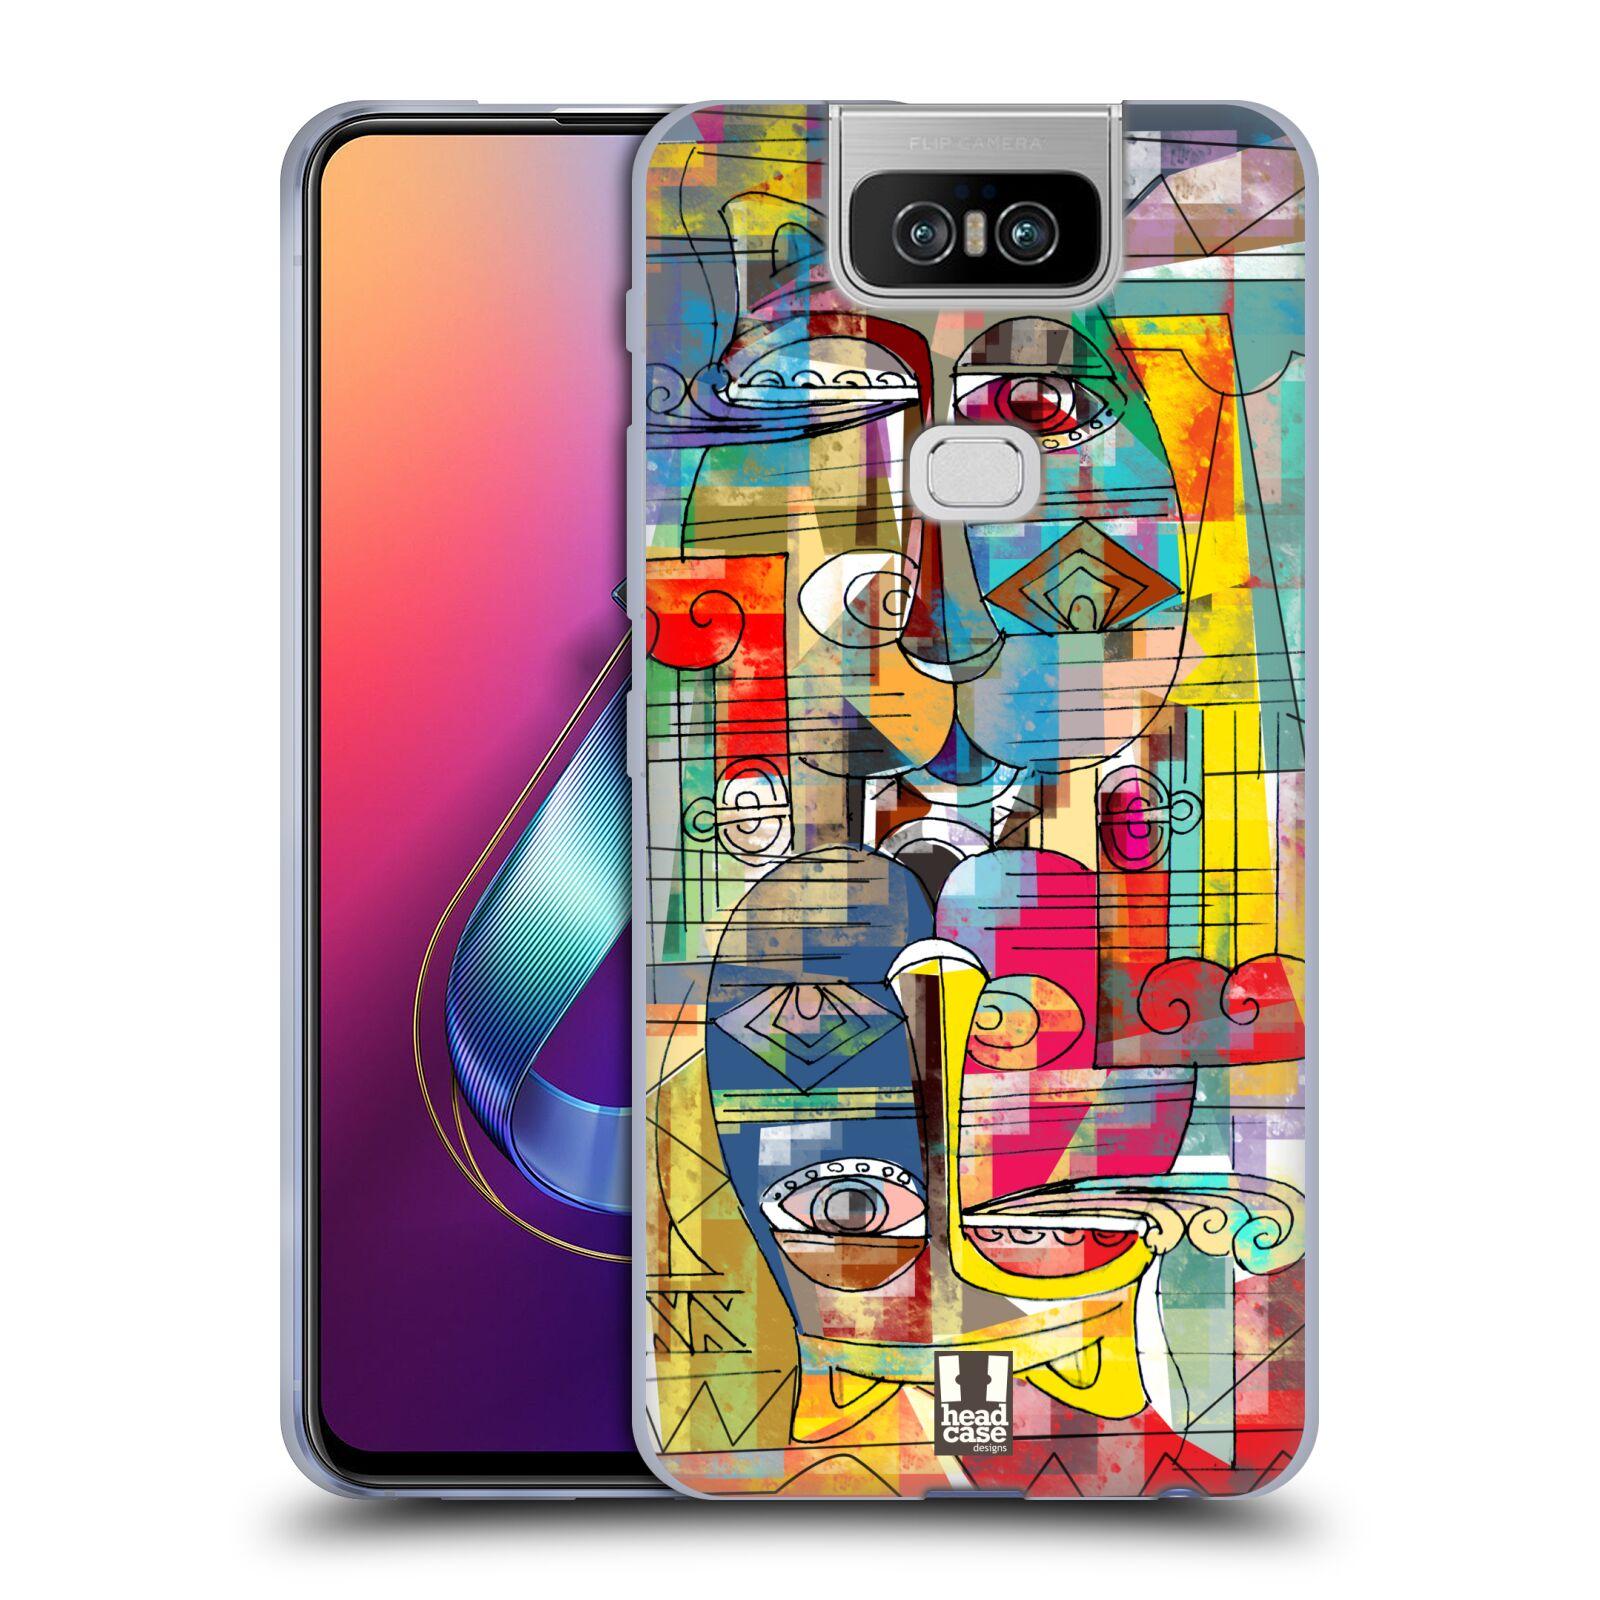 Silikonové pouzdro na mobil Asus Zenfone 6 ZS630KL - Head Case - AZTEC MANX